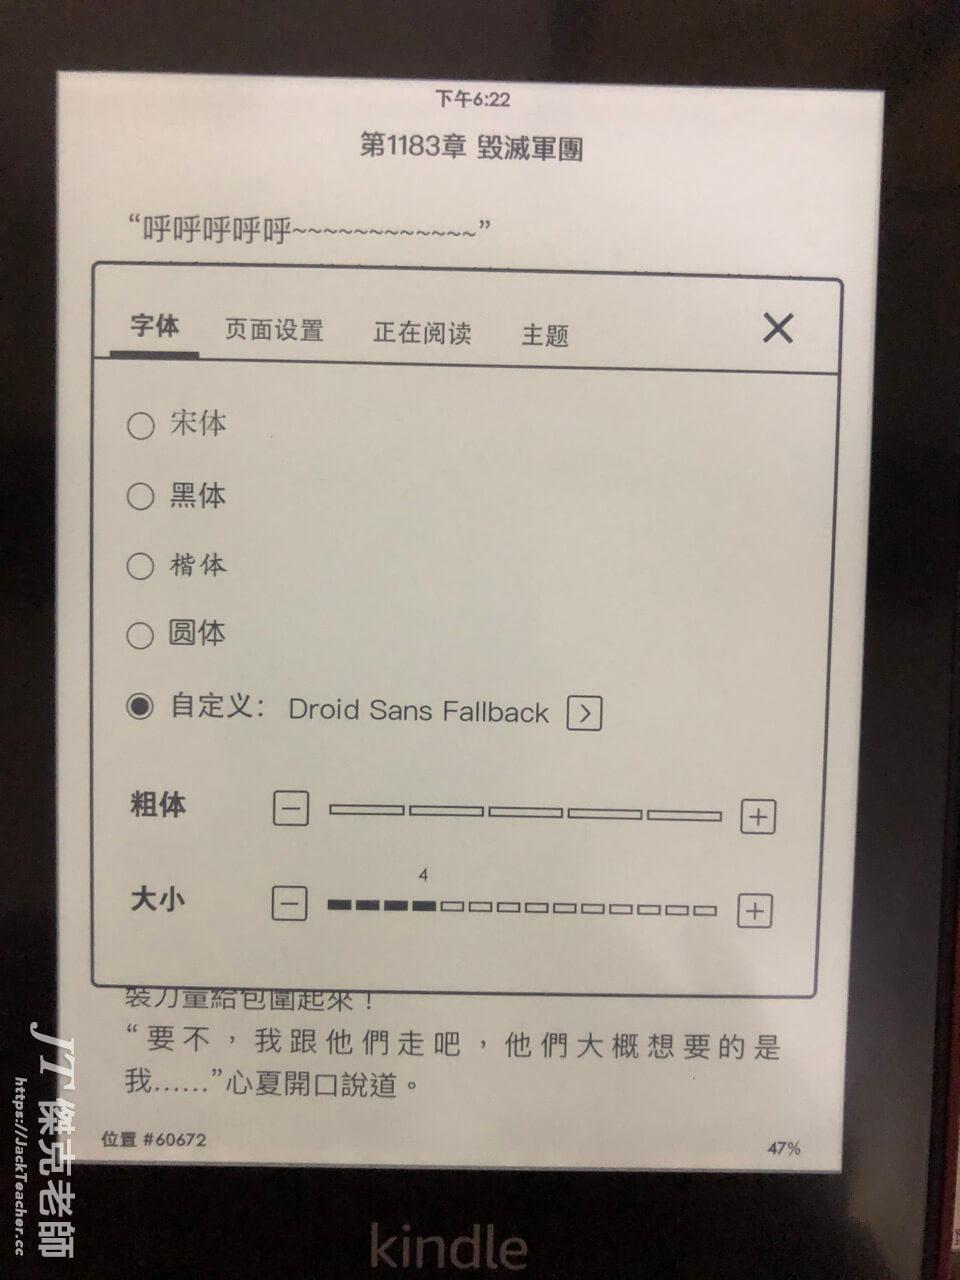 amazon allnew kindle paperwhite-10代上傳完字型後,自定義的繁體字體如何使用呢?在打開簡體文件的情況下,按上方出現選單,點選自定義